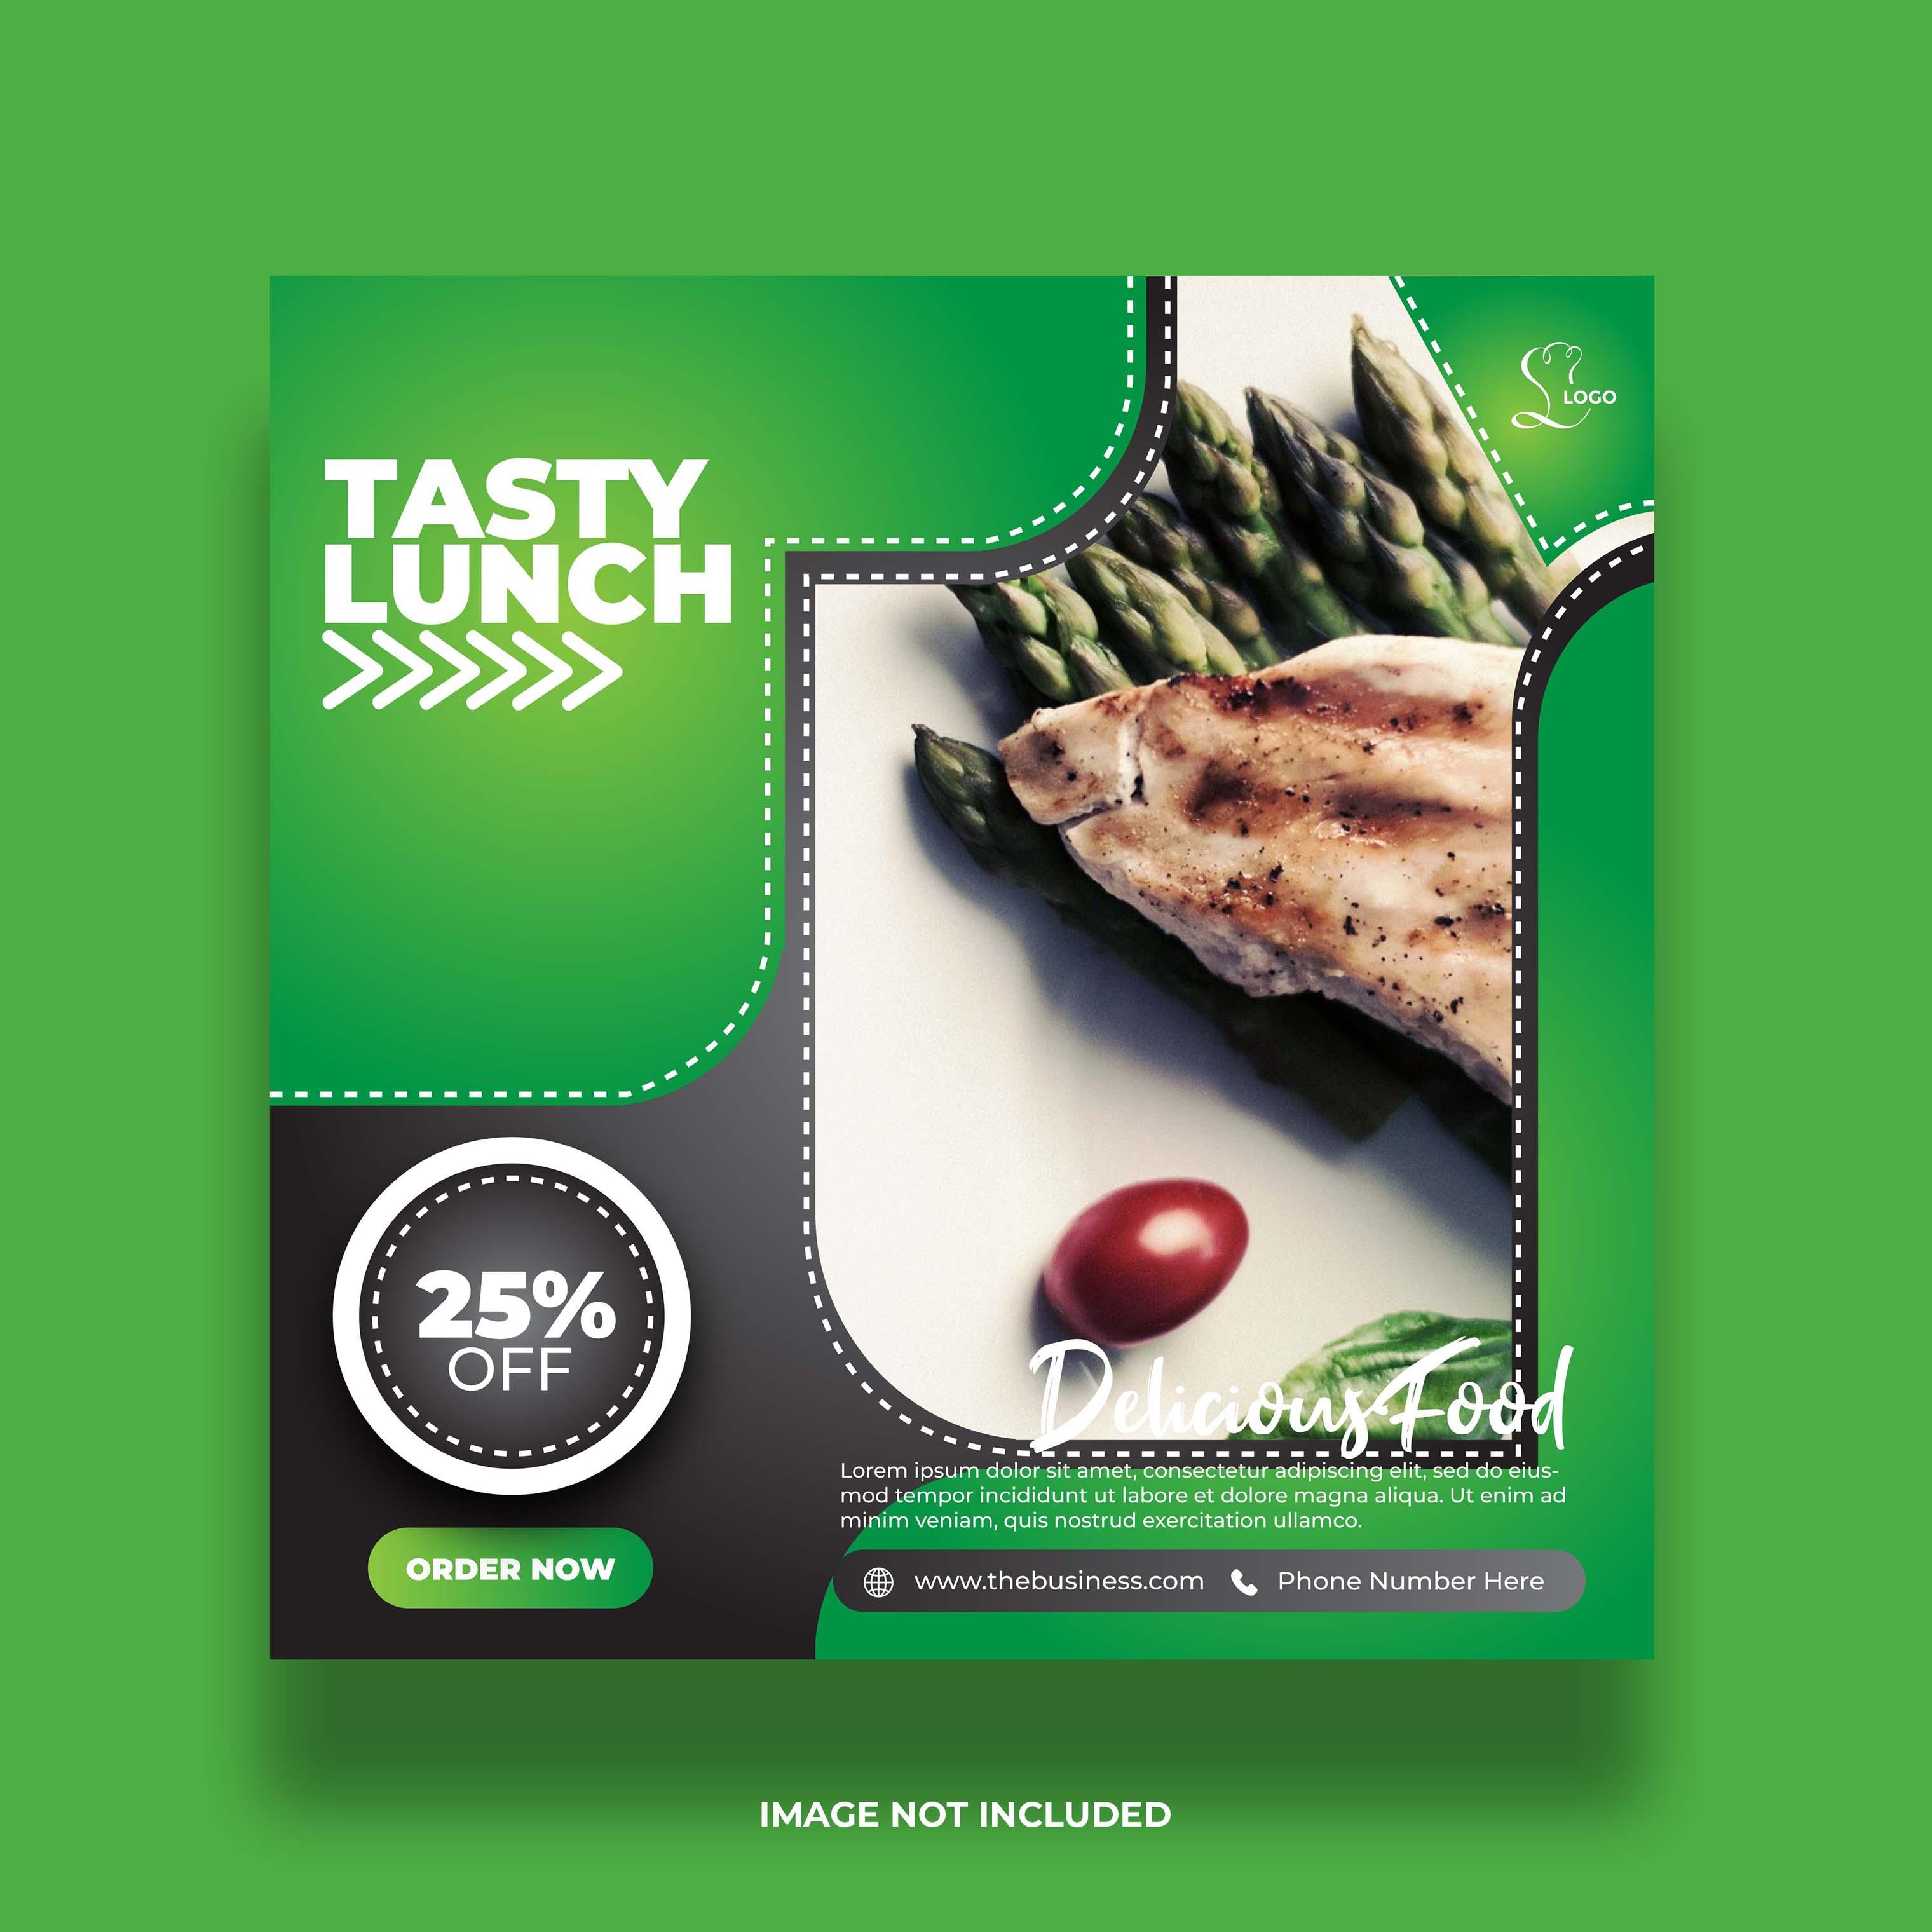 Colorful Minimal Green Food Restaurant Banner For Social Media Post